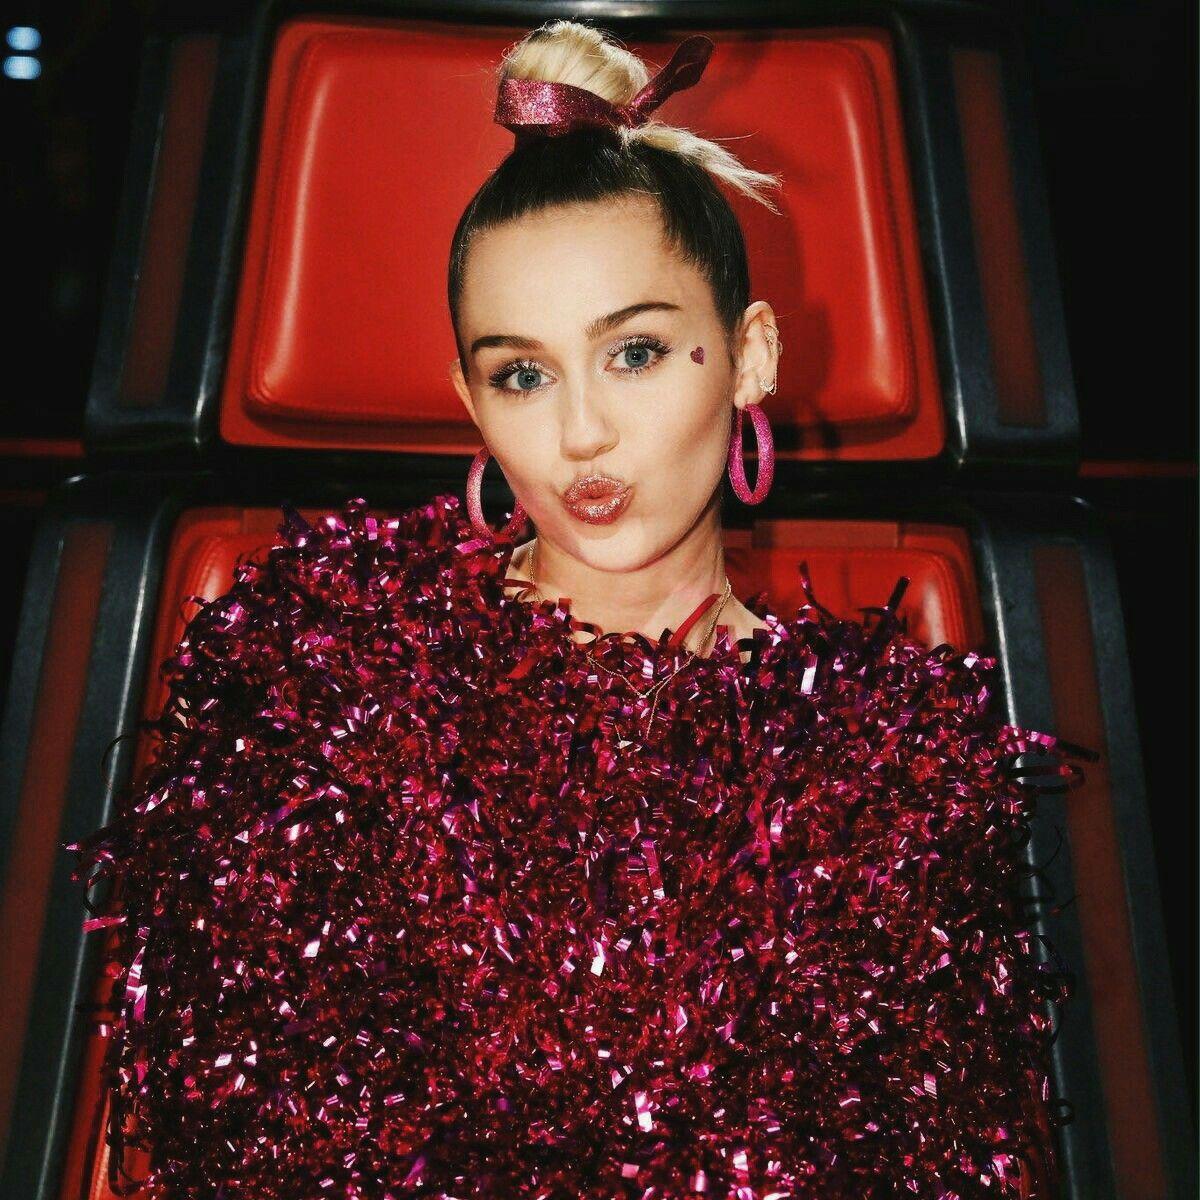 Pin de M O O N L I G H T♡ en Miley Cyrus.   Pinterest